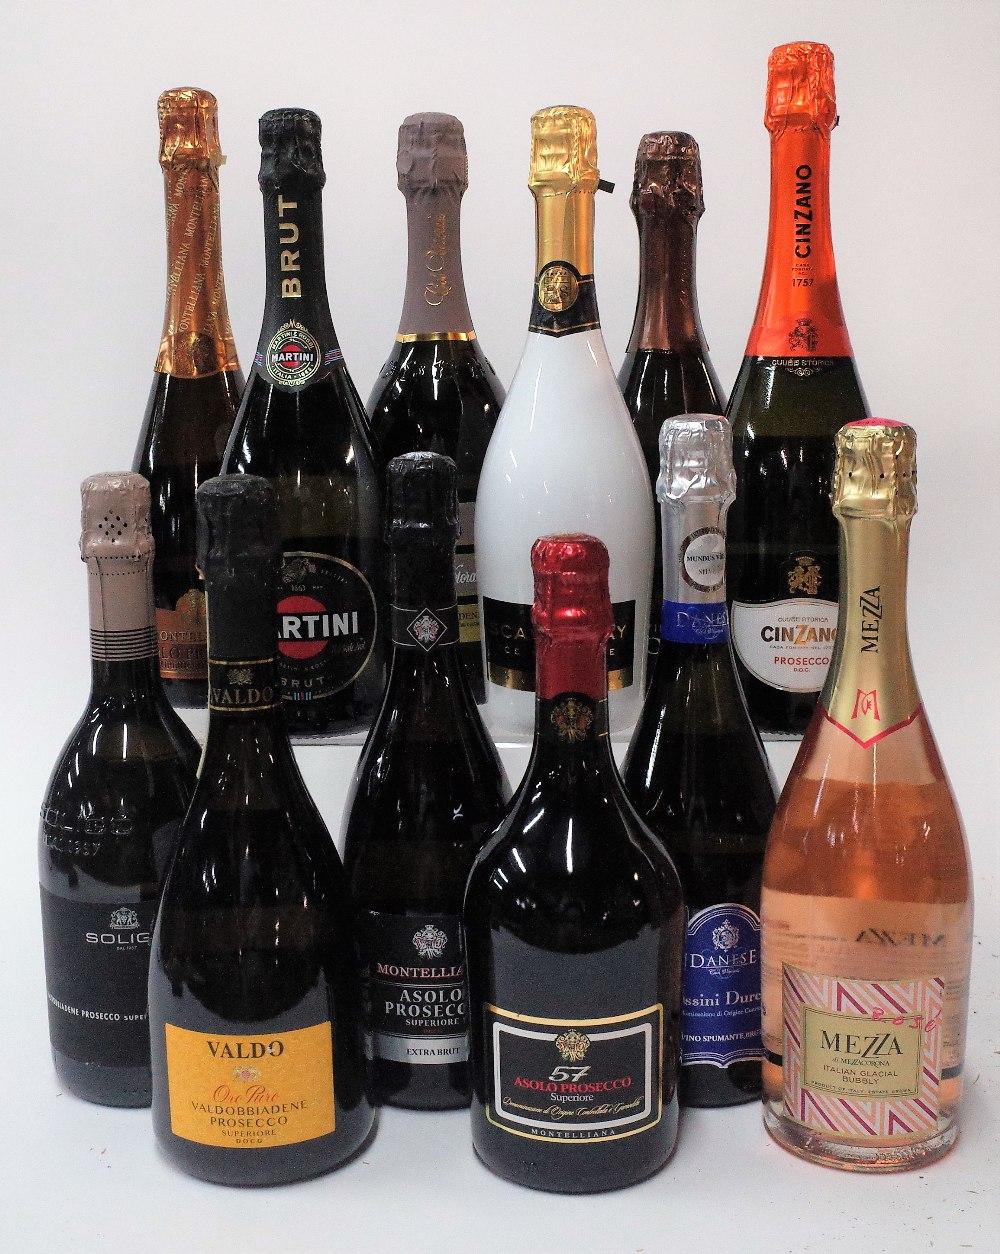 12 BOTTLES ITALIAN SPARKLING WINE - Image 2 of 2